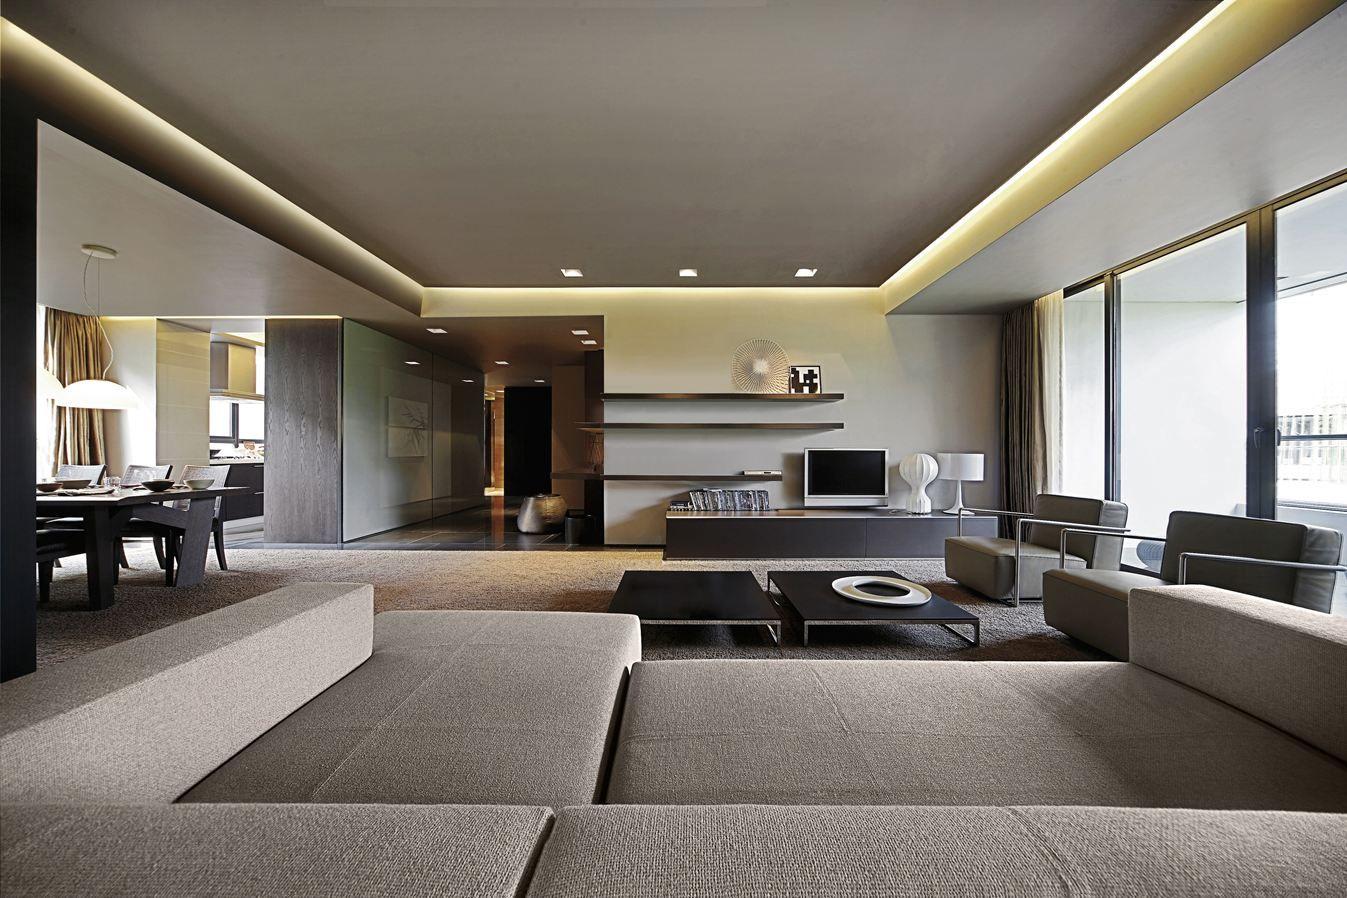 Farbe Grau -visuelle-effekte-wandgestaltung-satin-putz-beton ...